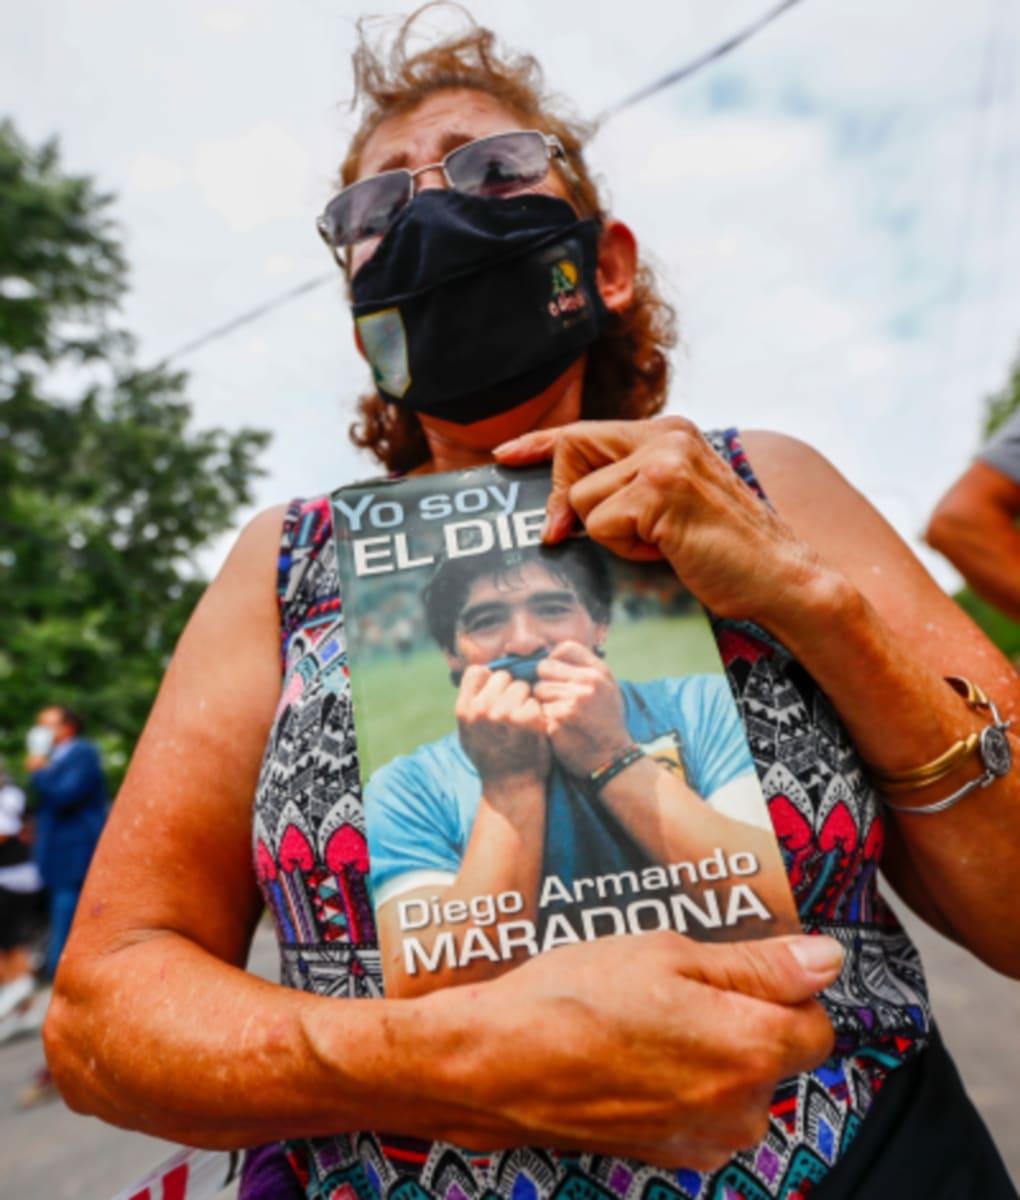 Autopsia de Maradona confirma que murió de un ataque al corazón